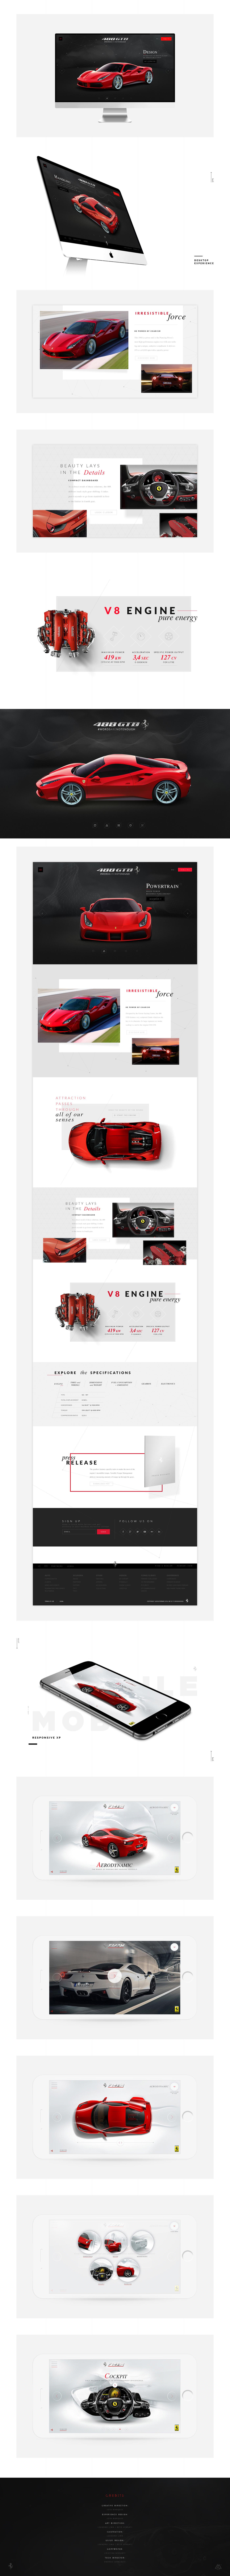 ux UI xD Experience design experience design digital experience digital art direction FERRARI Ferrari 488 GTB 488 GTB Responsive mobile